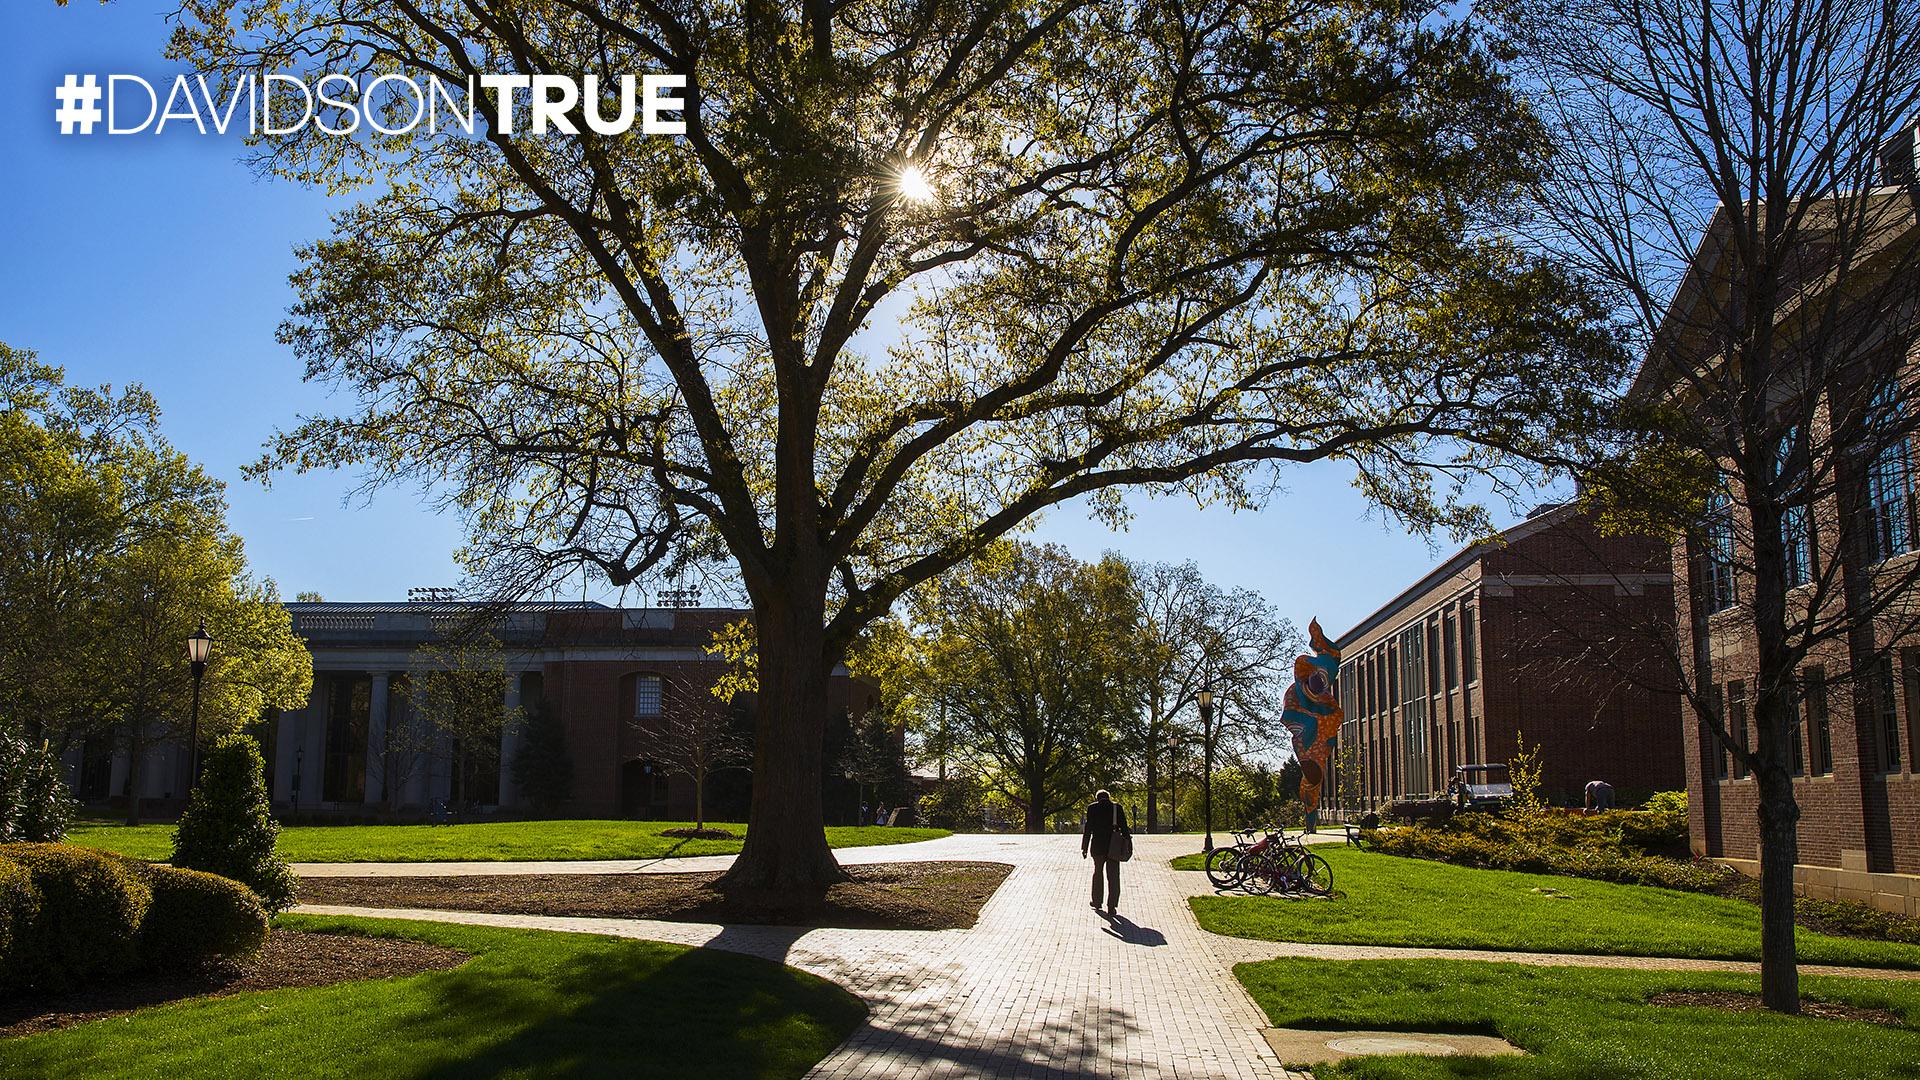 Campus with #DAVIDSONTRUE